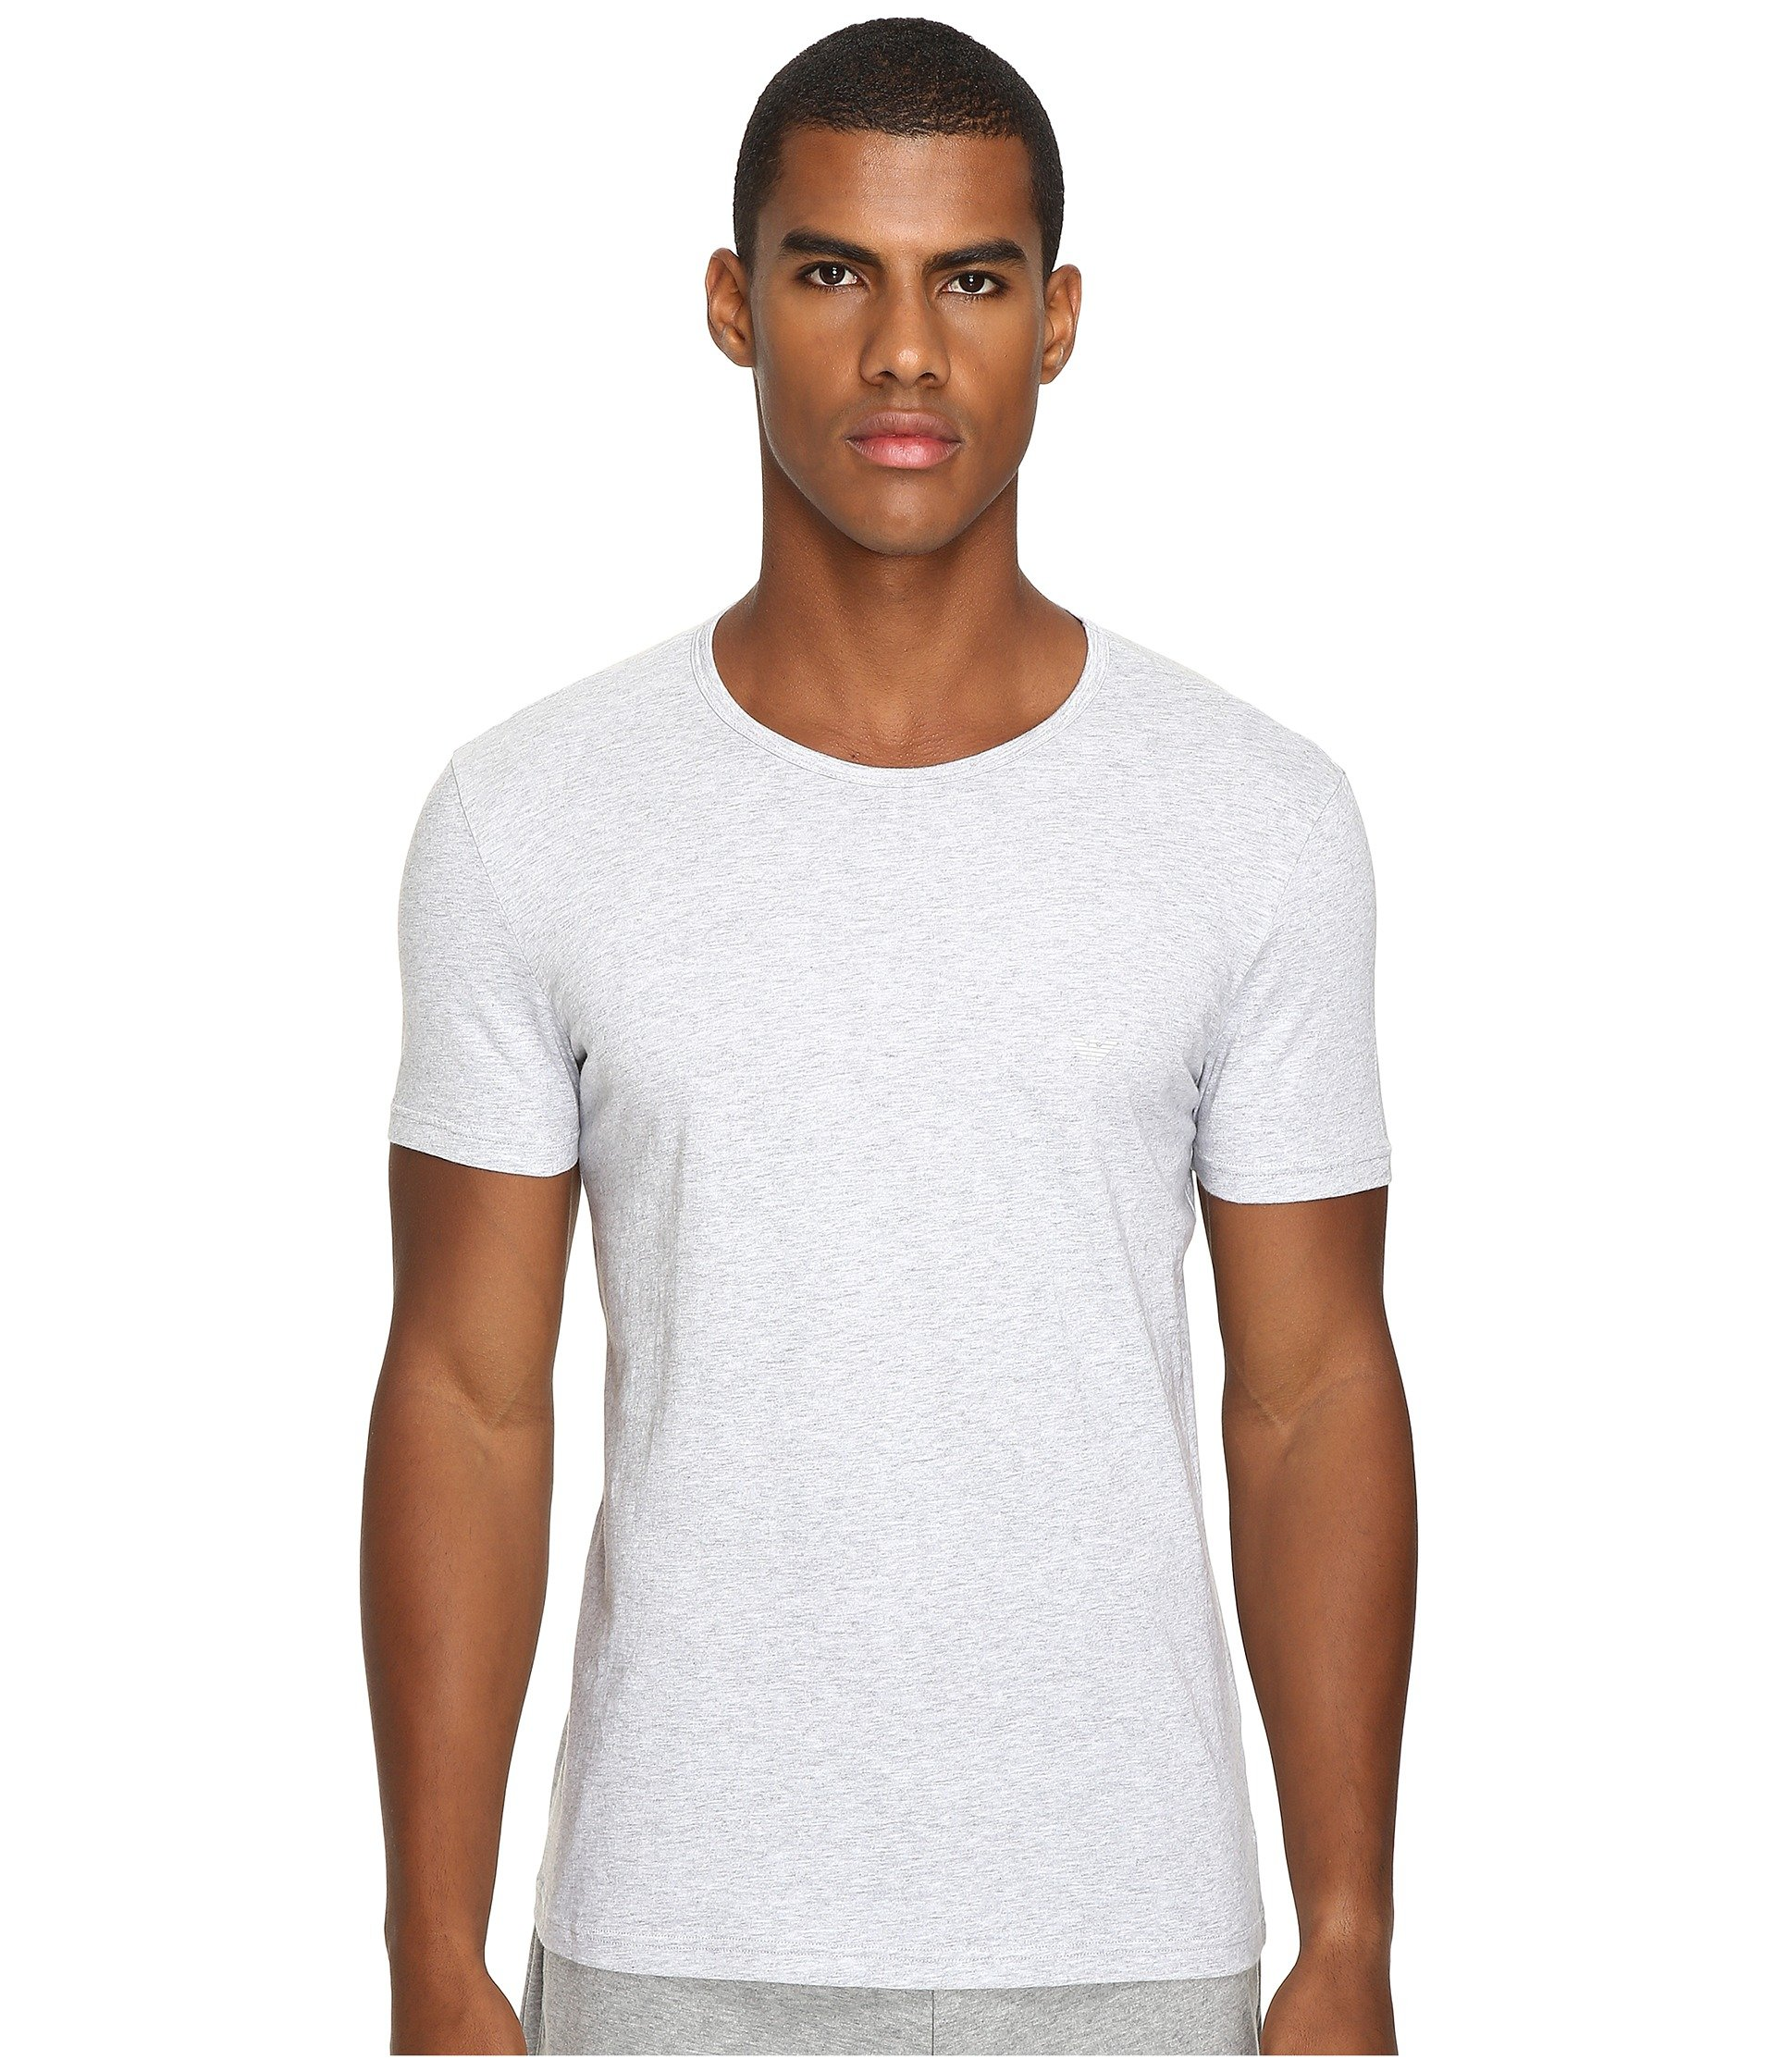 grey Melange navy Emporio pack Crew shirt Neck Armani T 3 White nwqZa